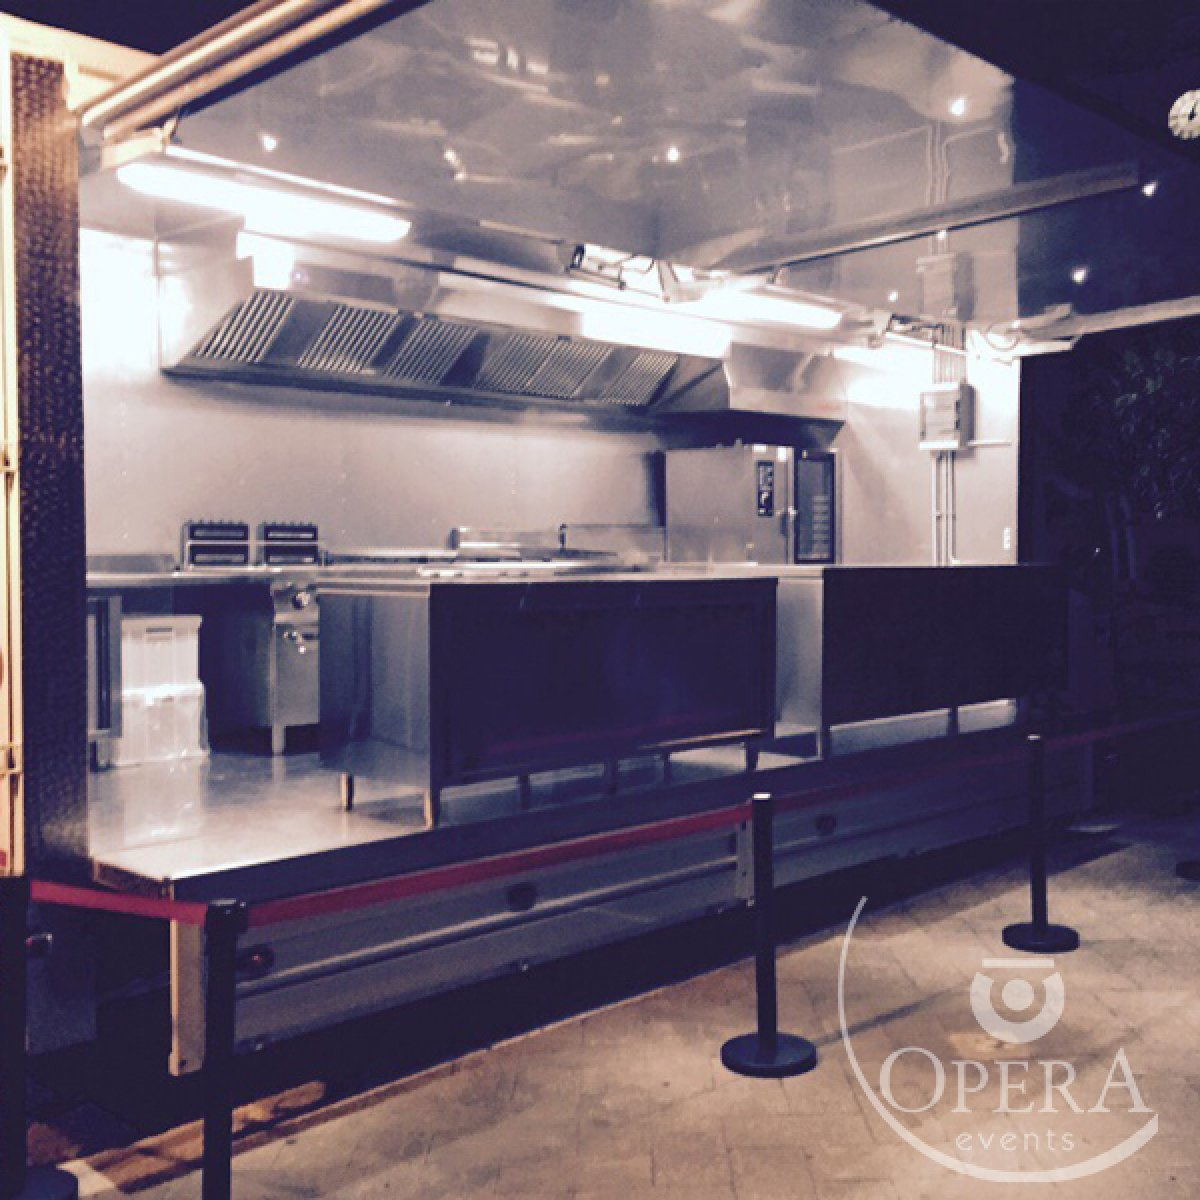 Noleggio camion cucina mobile professionale per eventi - Opera ...